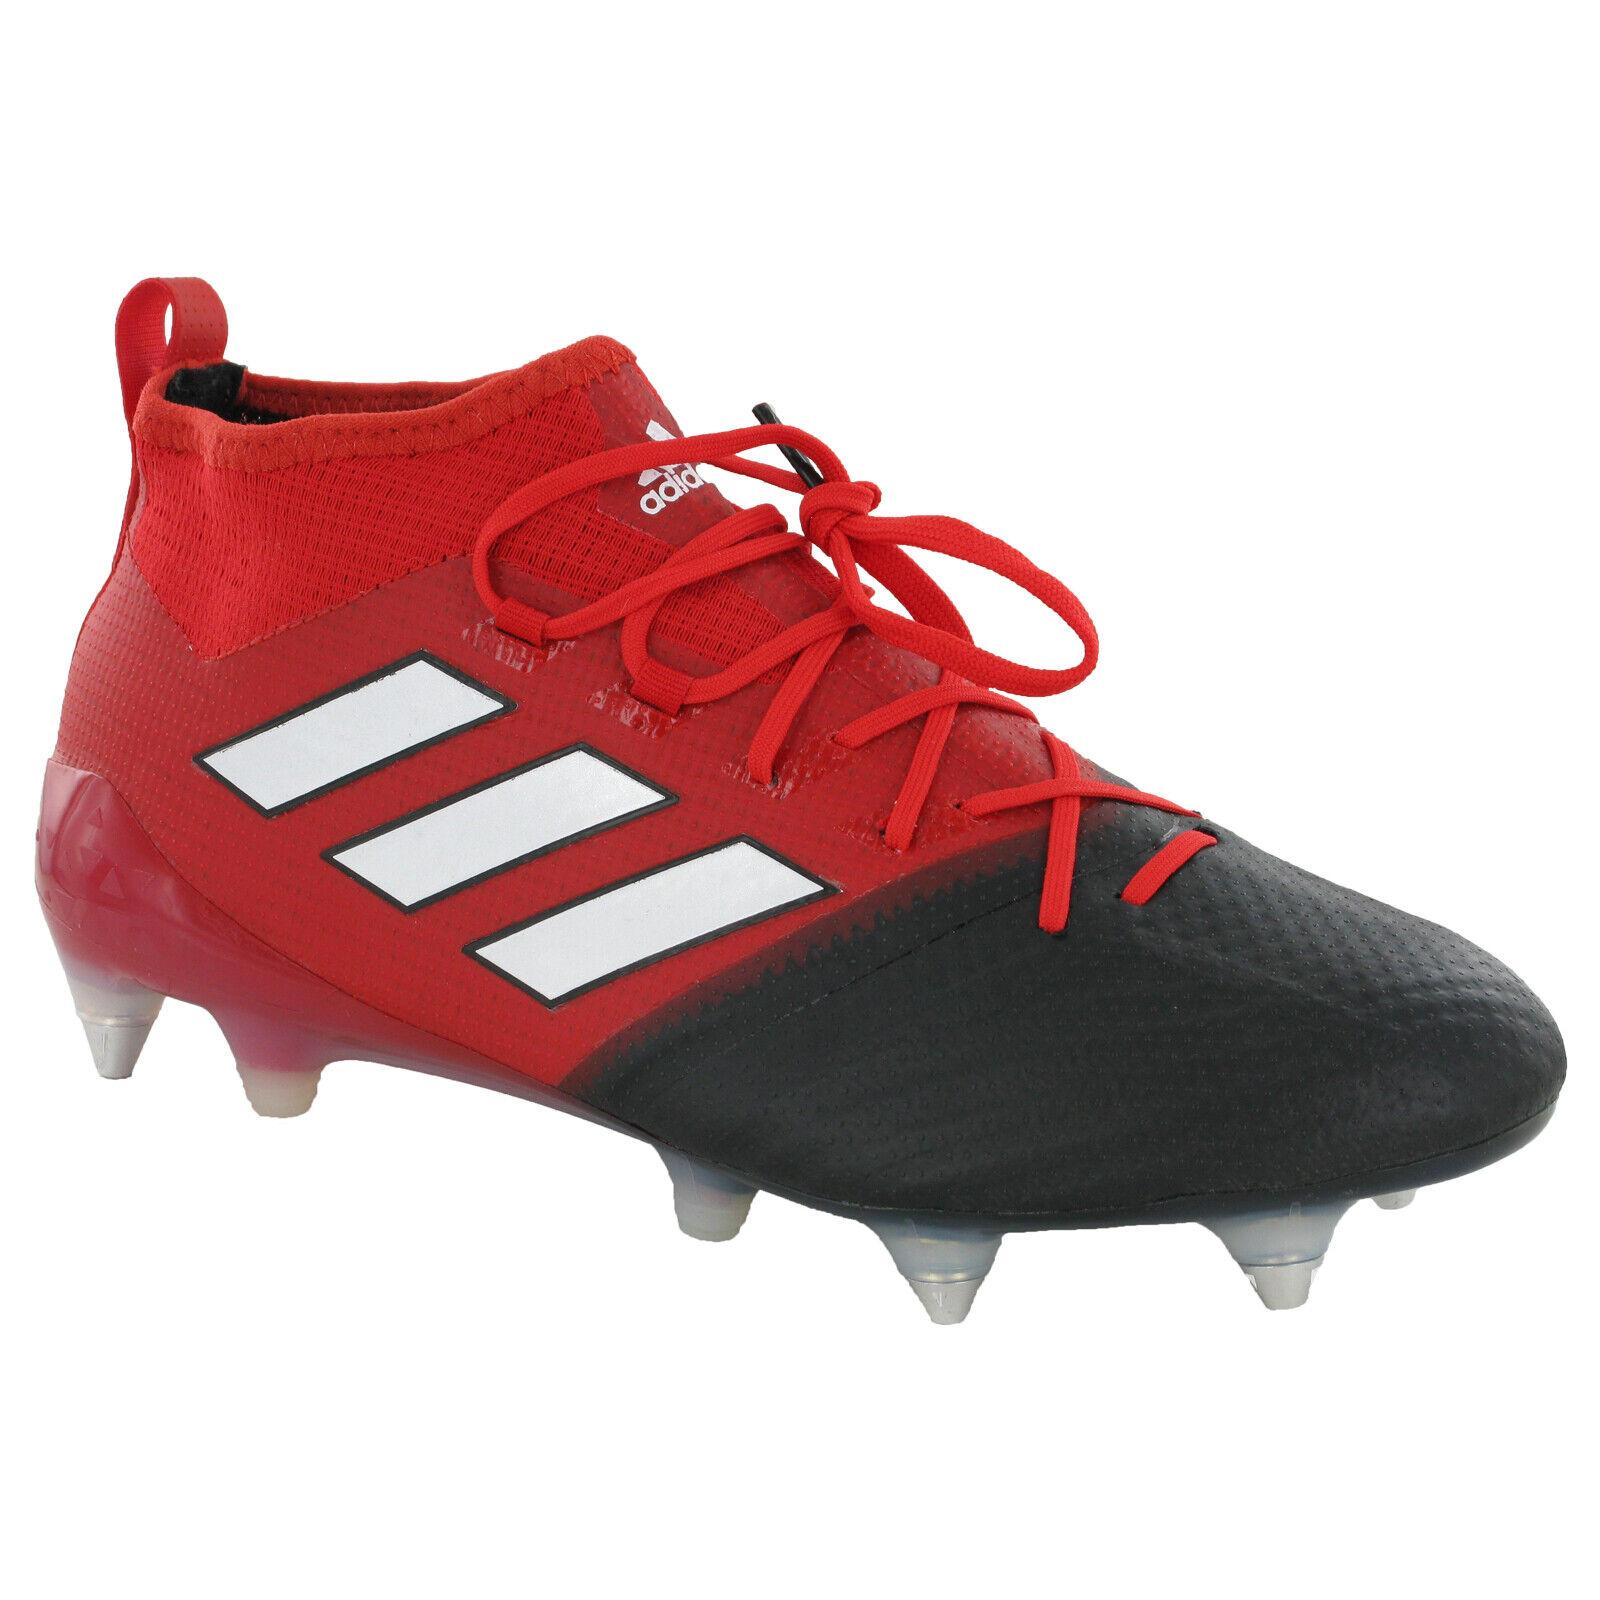 Adidas ACE 17.1 PRIMEKNIT SG Football